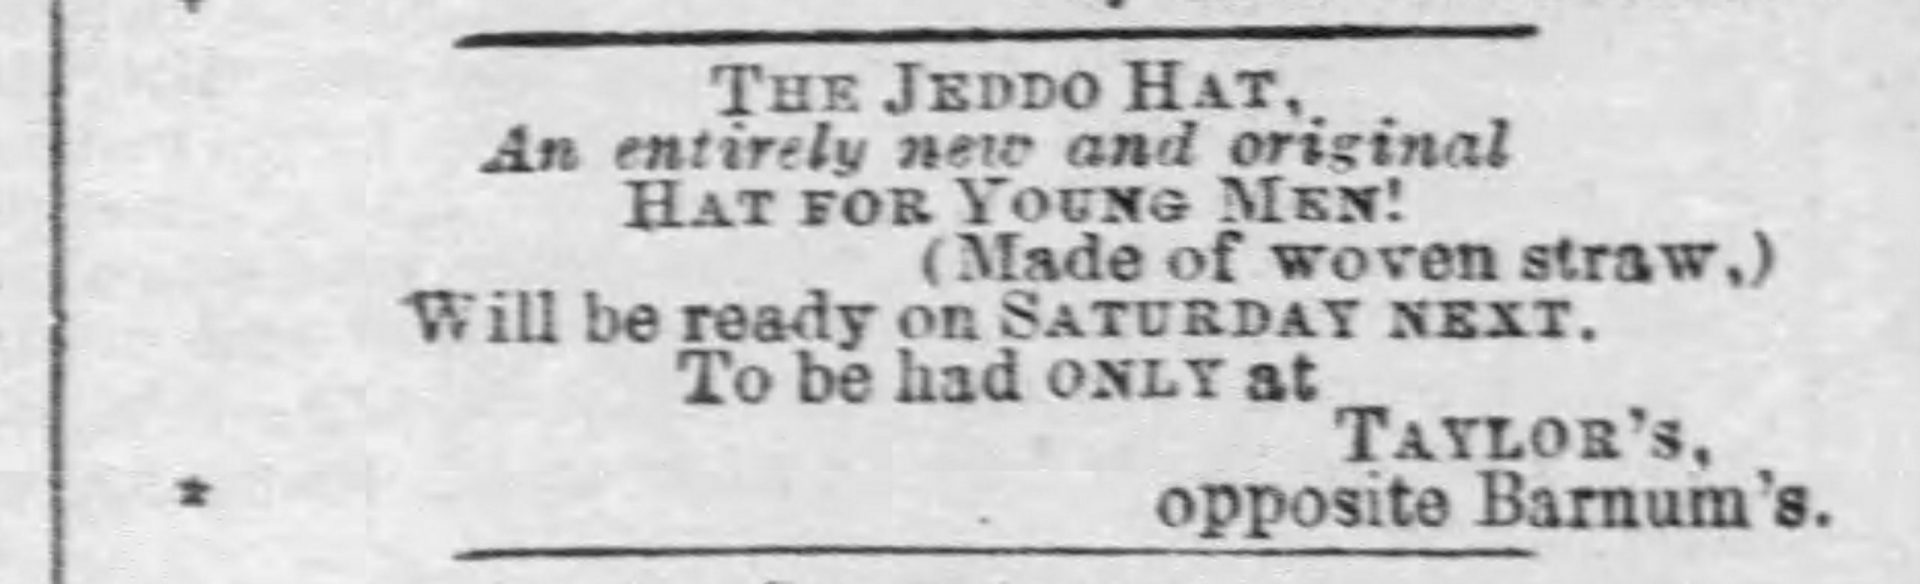 Jeddo Hat, The Baltimore Sun, The Straw Shop